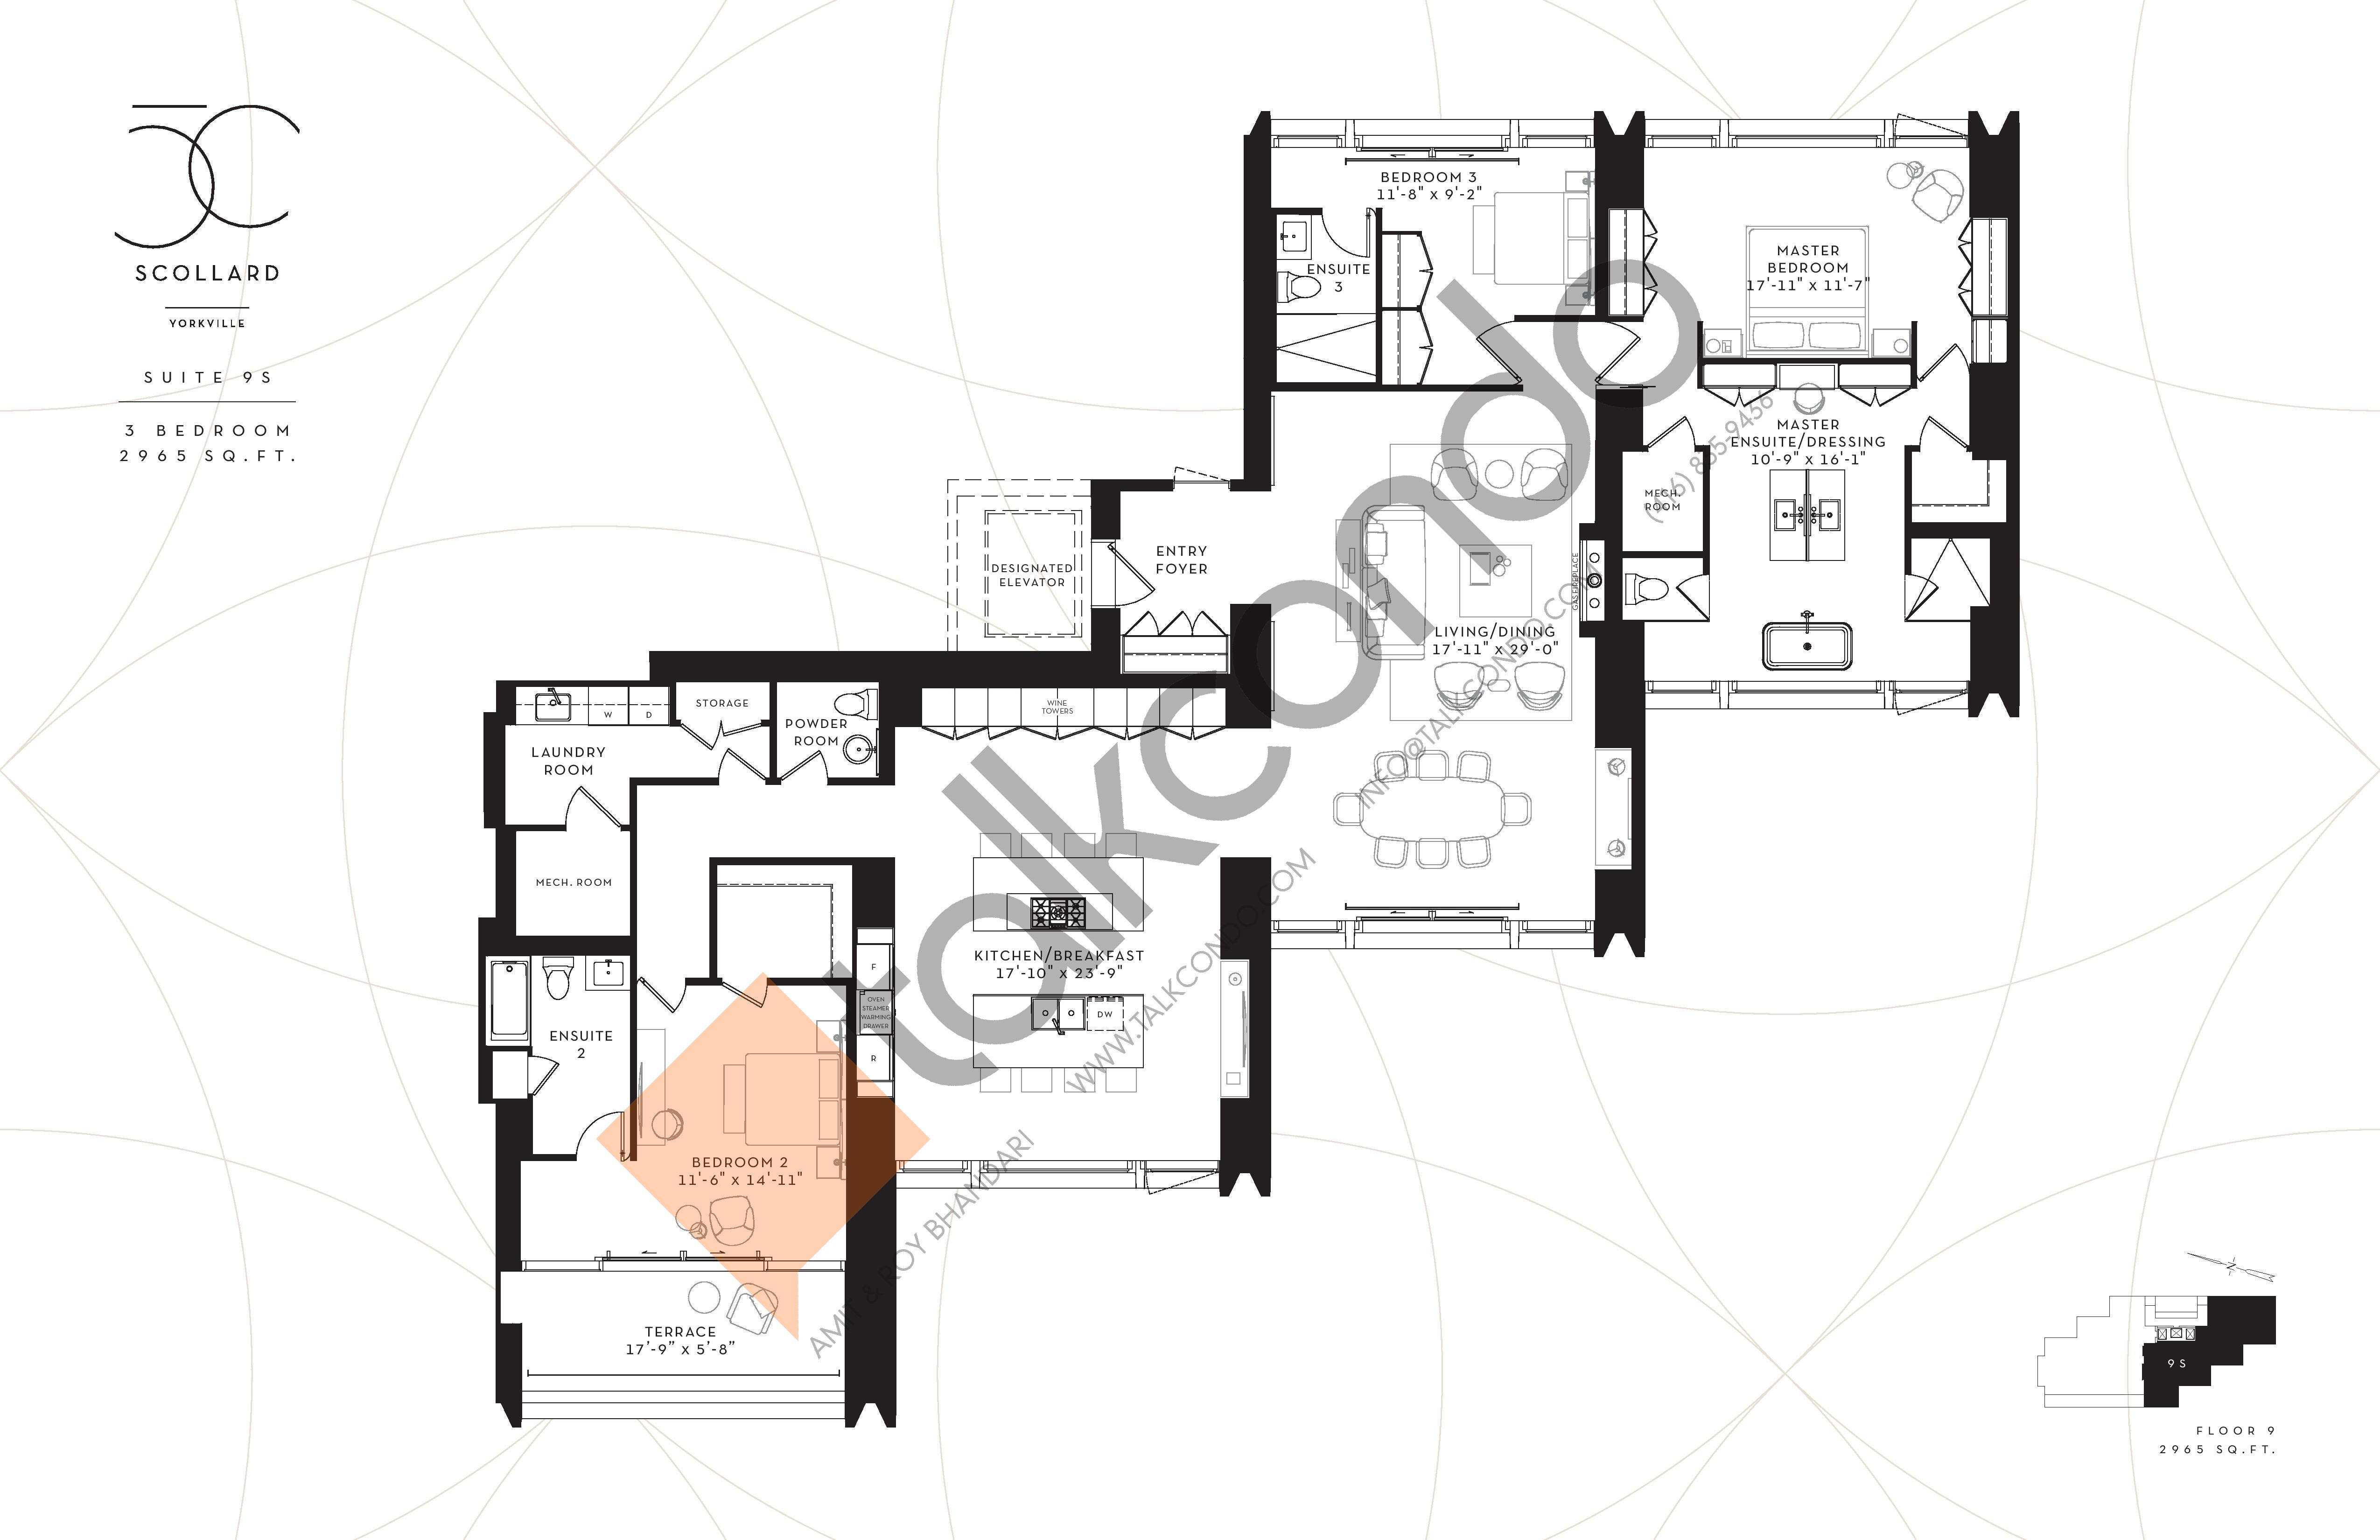 Suite 9S Floor Plan at Fifty Scollard Condos - 2965 sq.ft